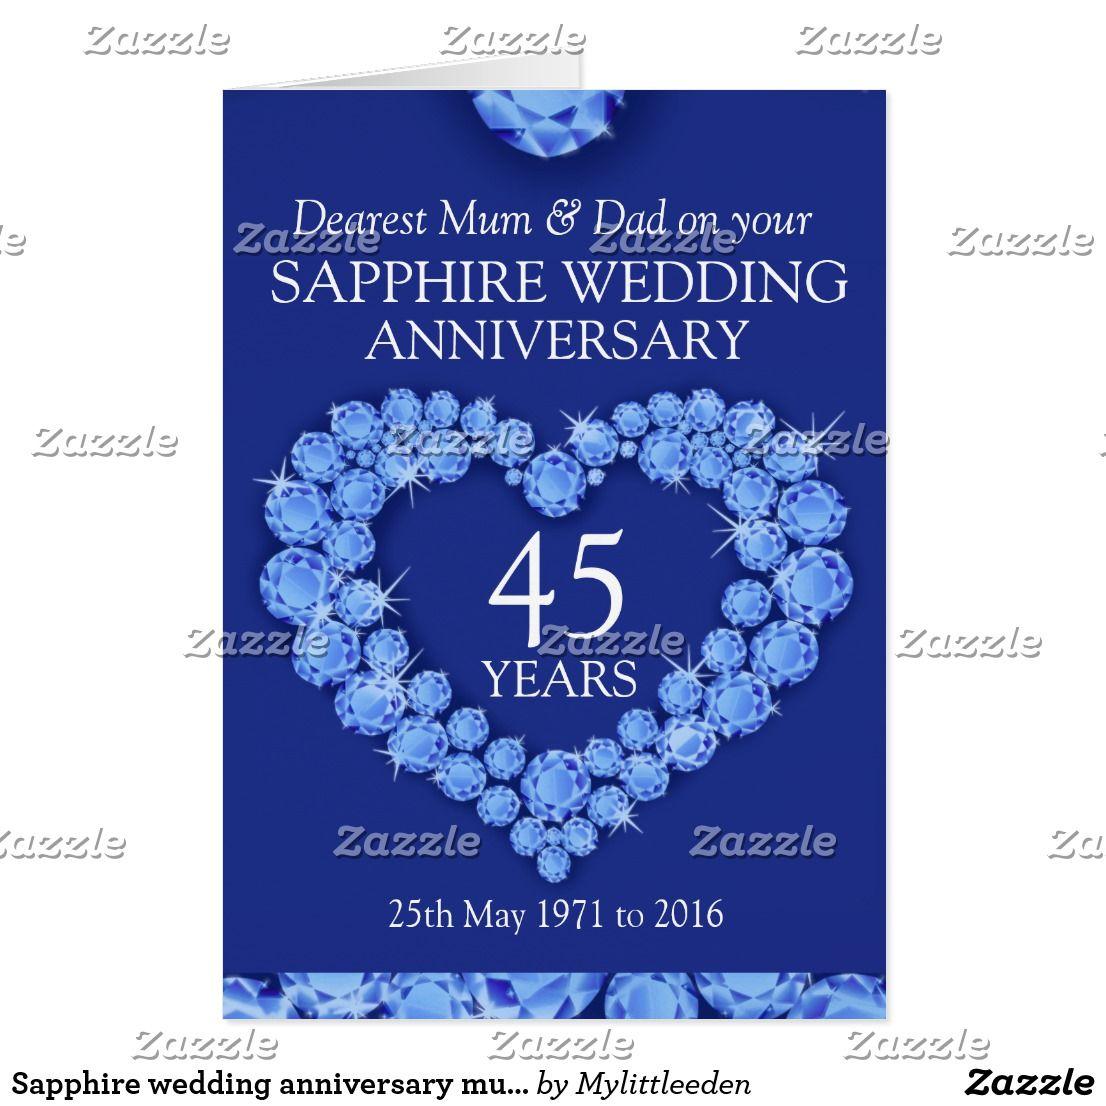 Sapphire wedding anniversary mum and dad card Zazzle.co